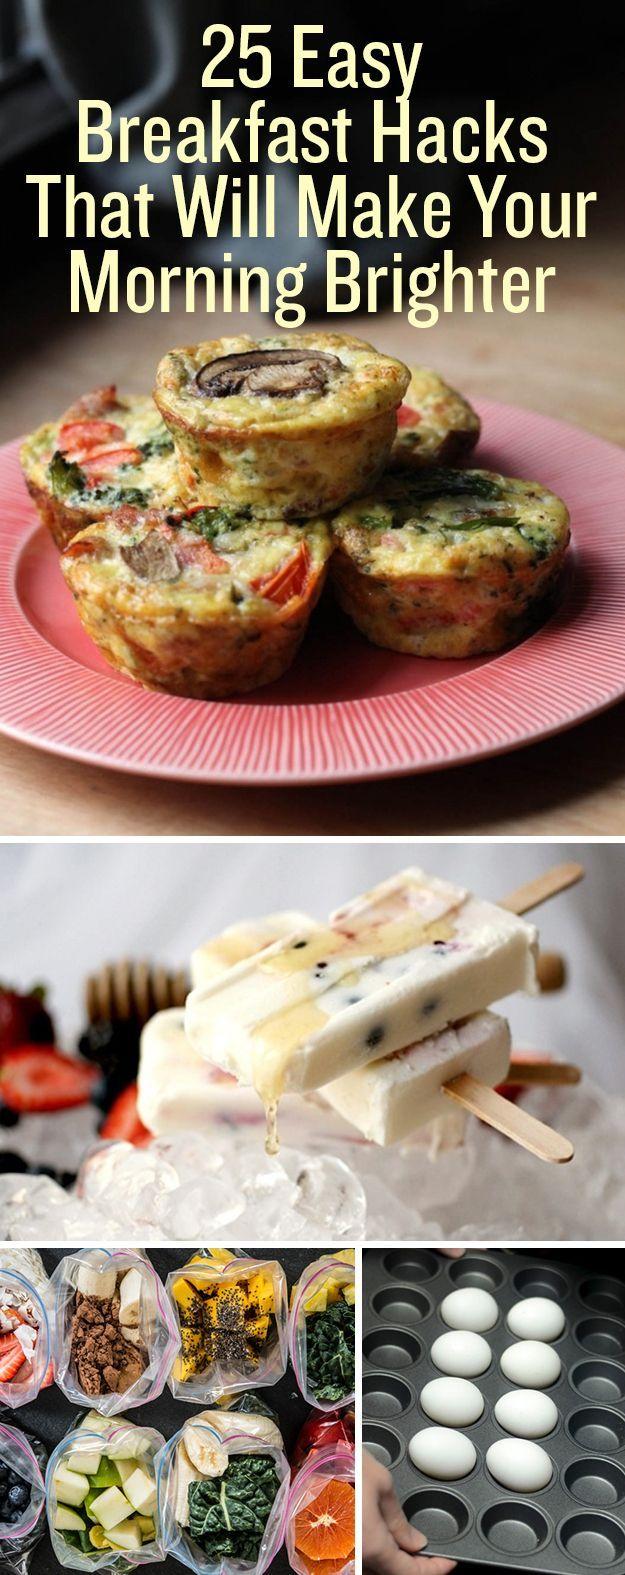 25 Easy Breakfast Hacks To Make Your Morning Brighter Recipes Easy Breakfast Food